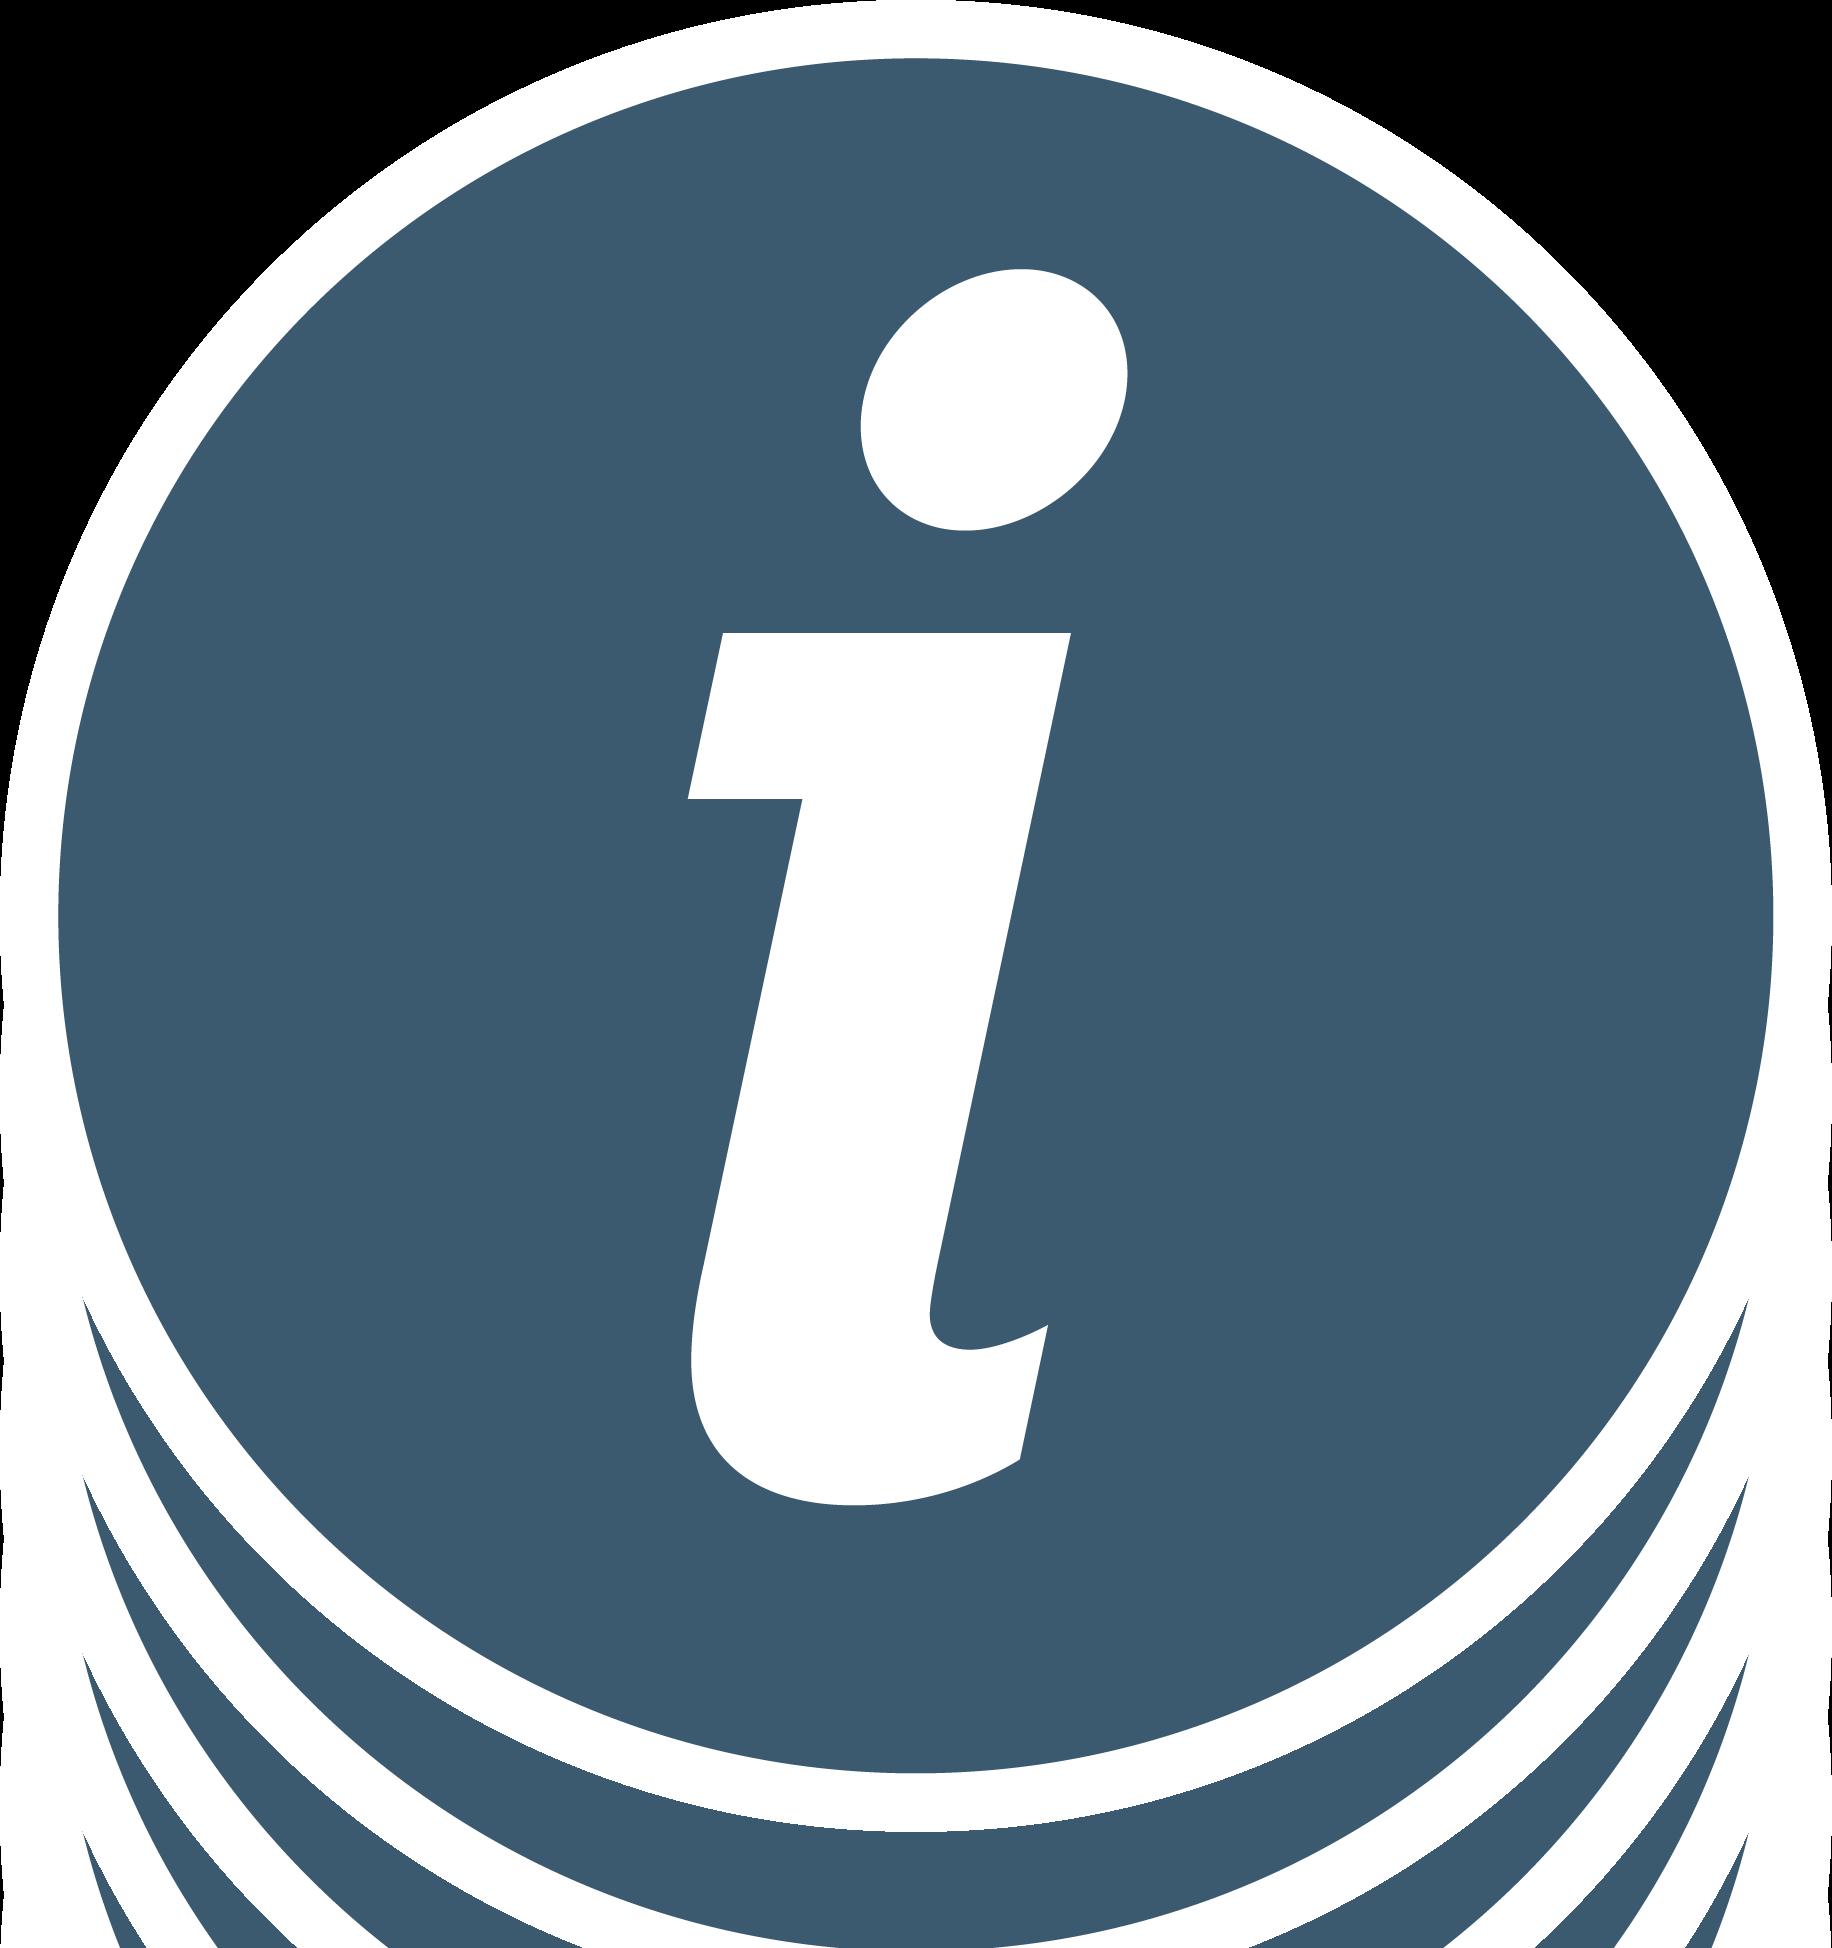 PNG Information - 52700